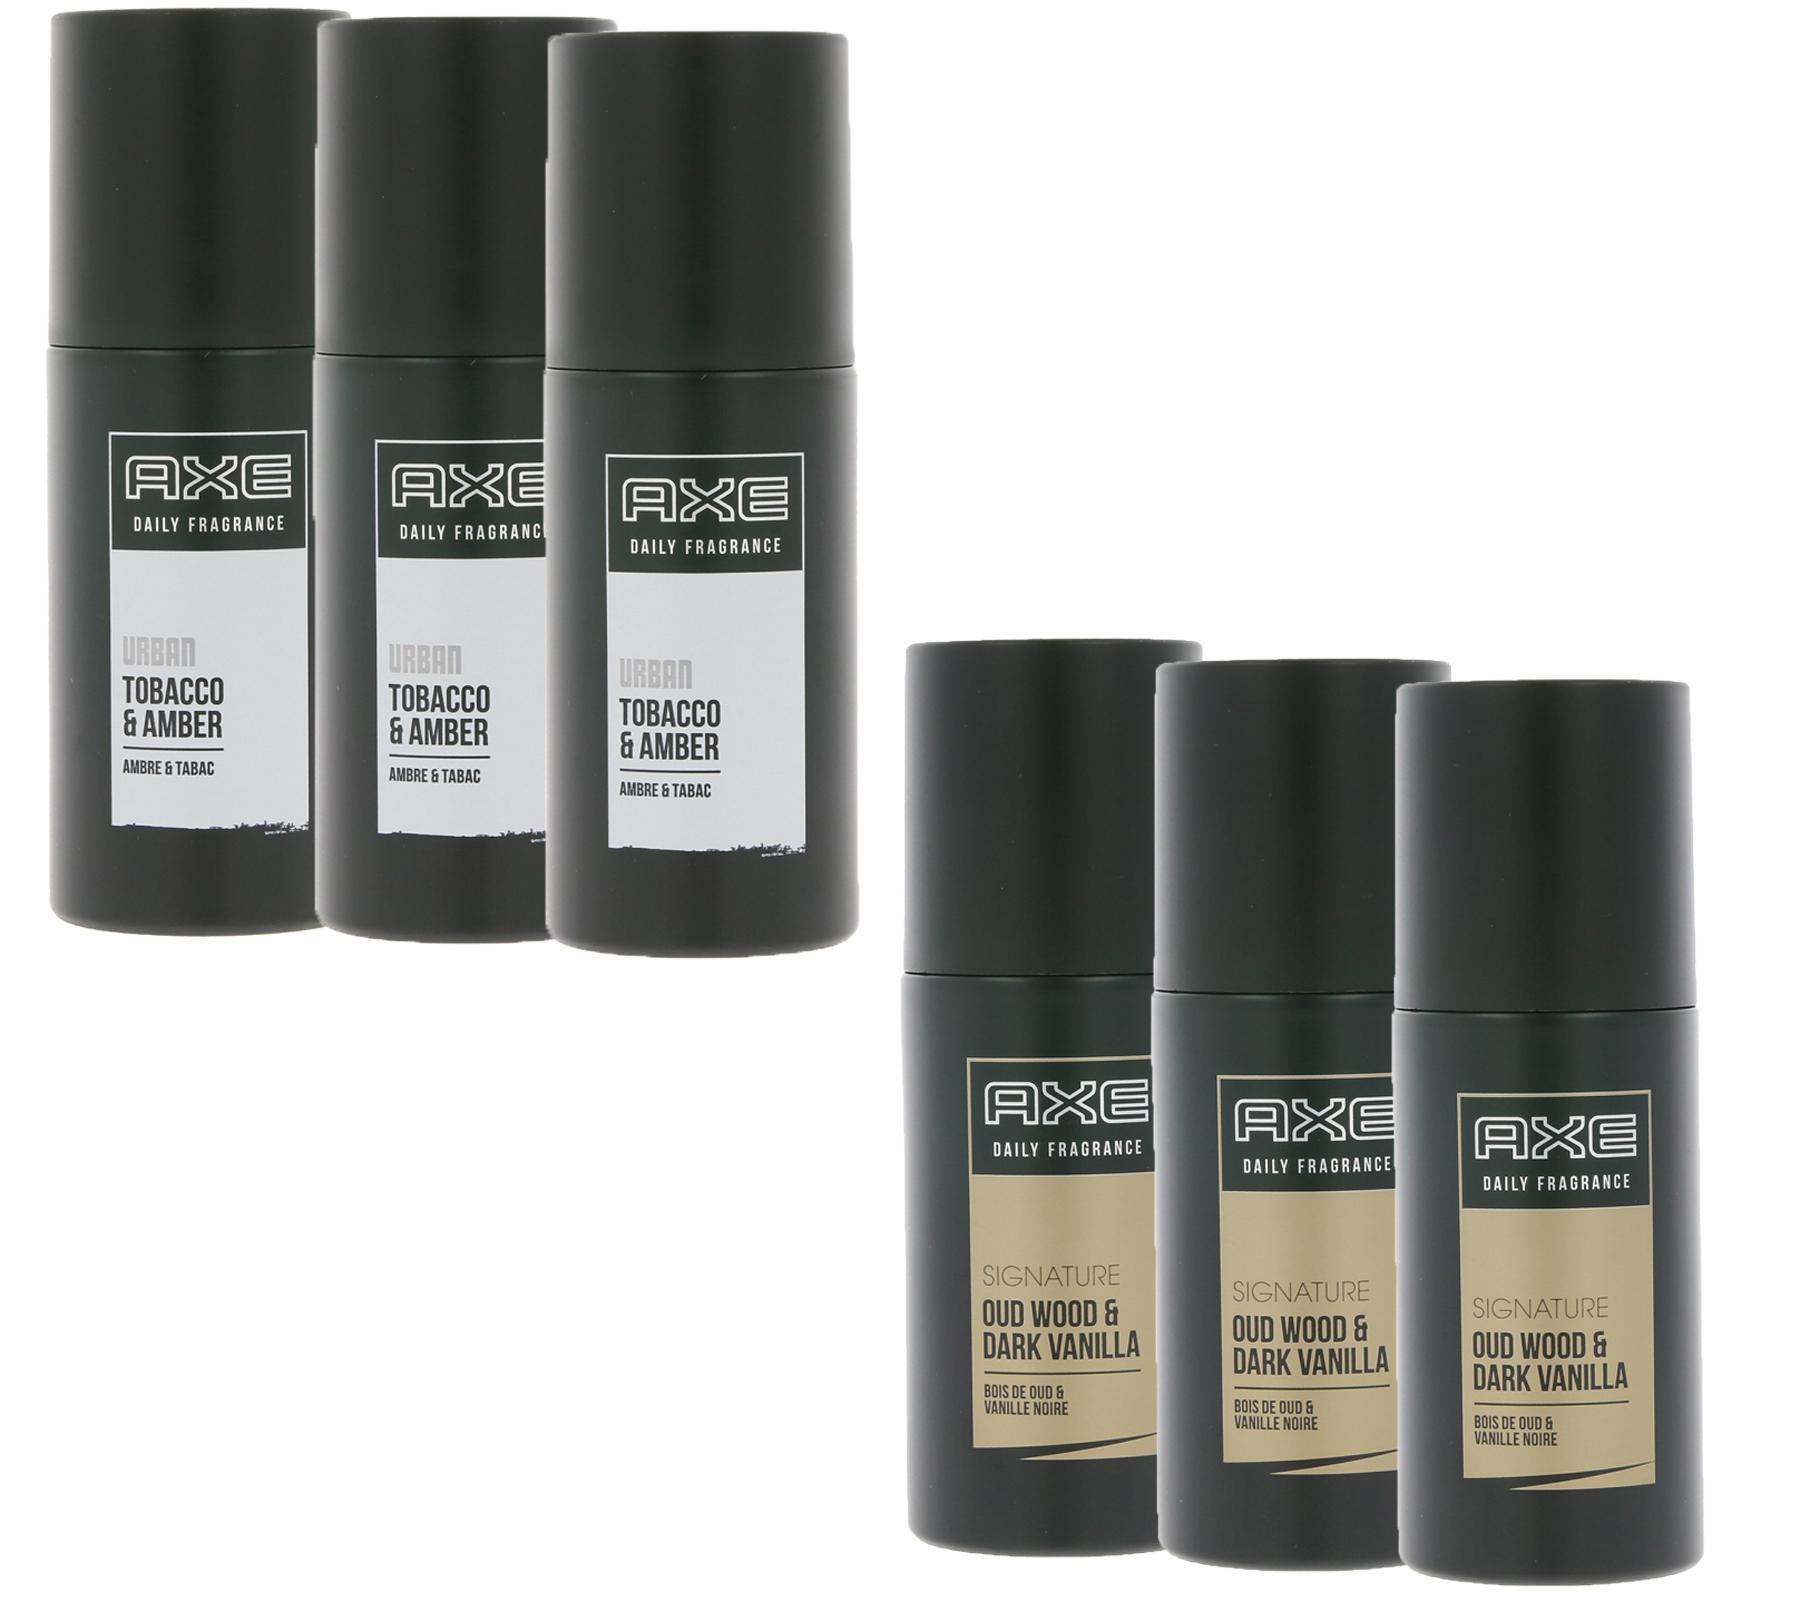 3er-Pack Axe Daily Fragrance Precision Herrenduft für 9,99€ [Outlet46]